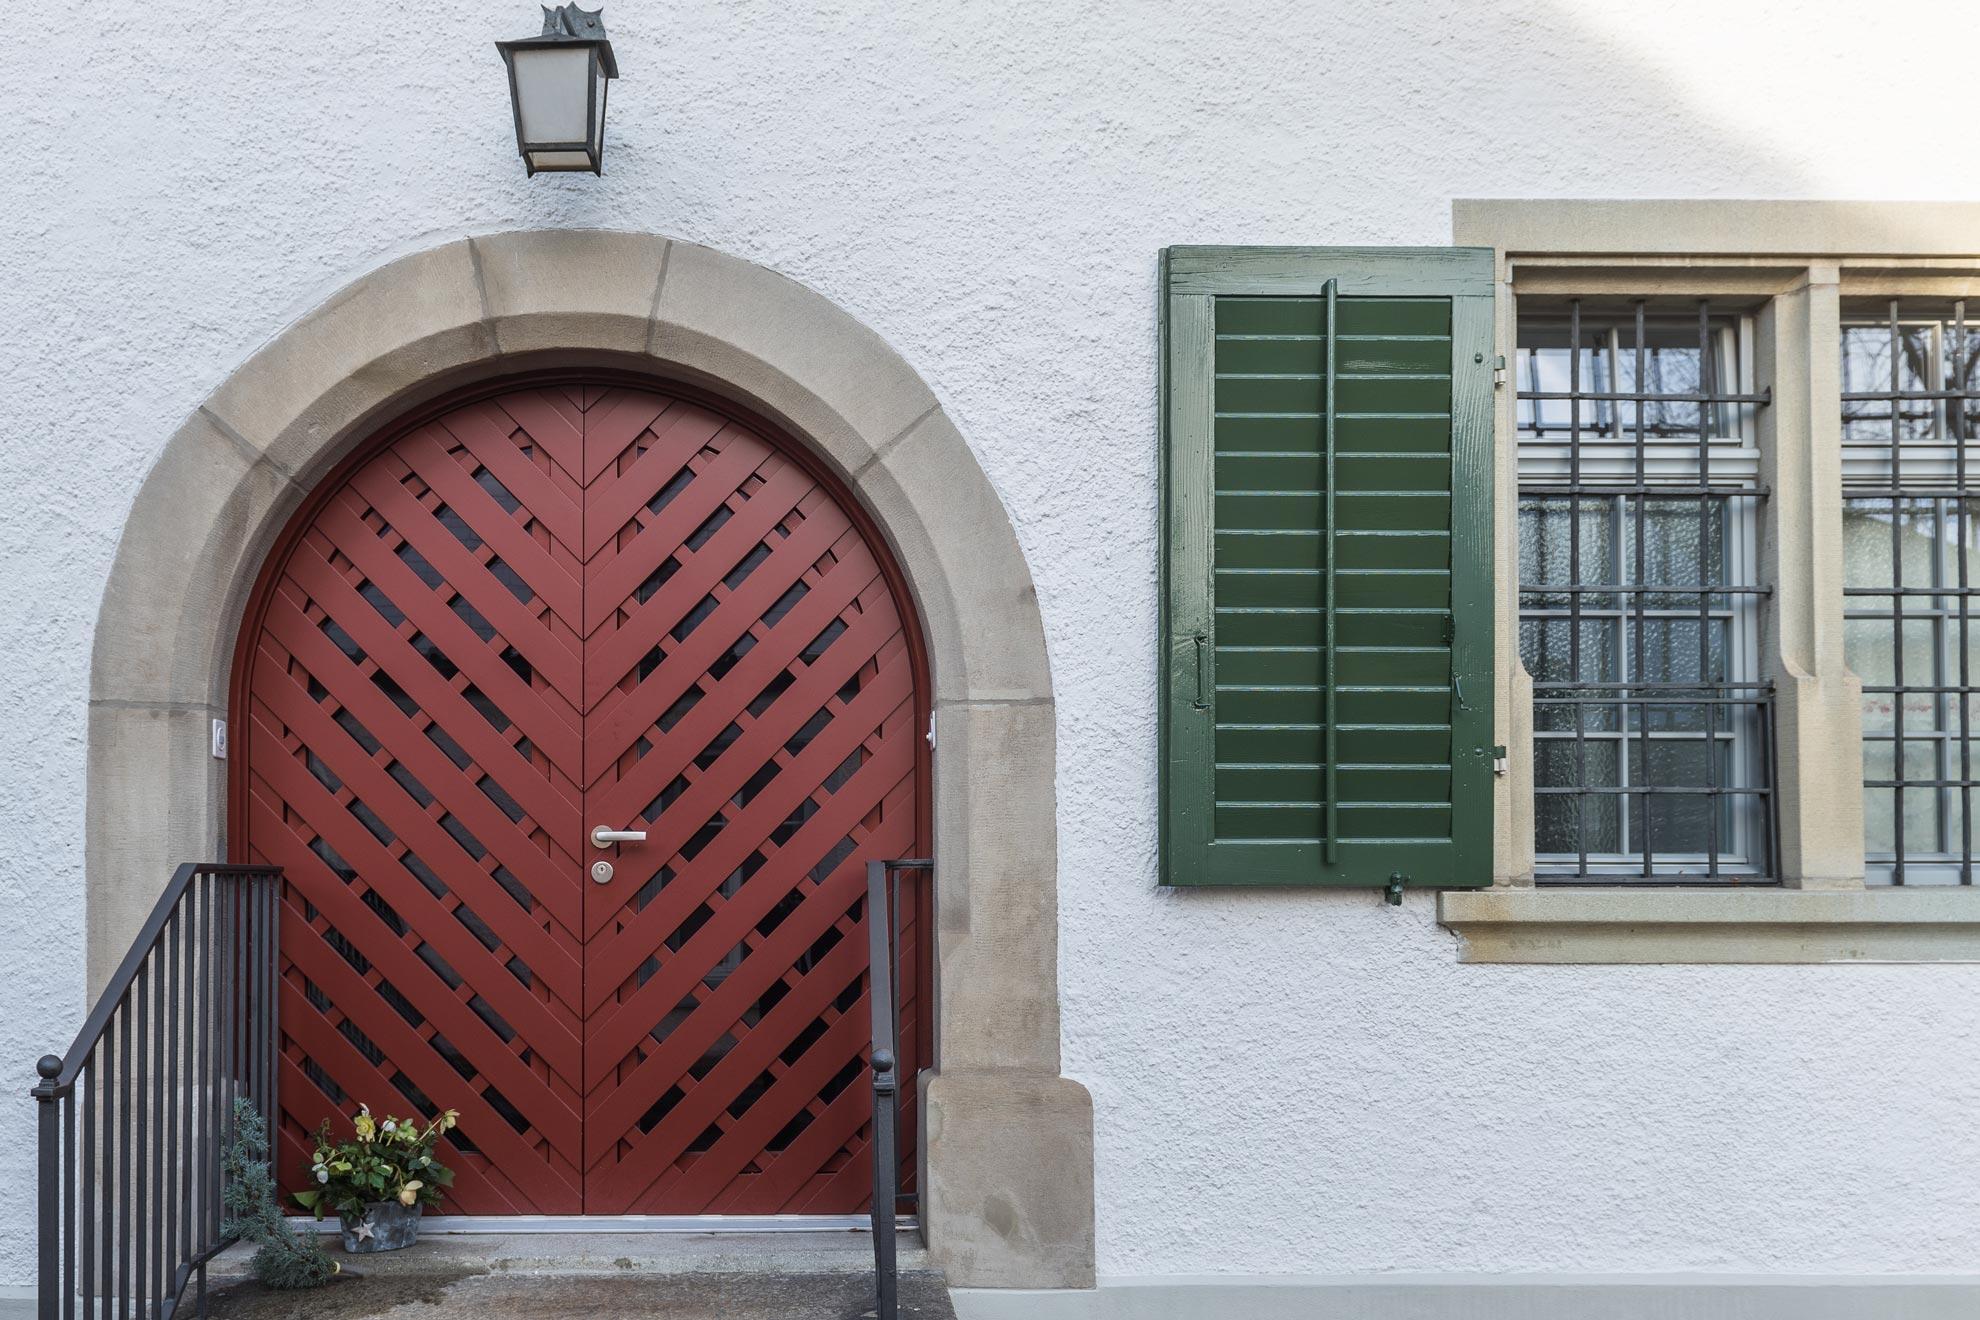 fassade-pfarrhaus-riegelbau-detail-3zu2